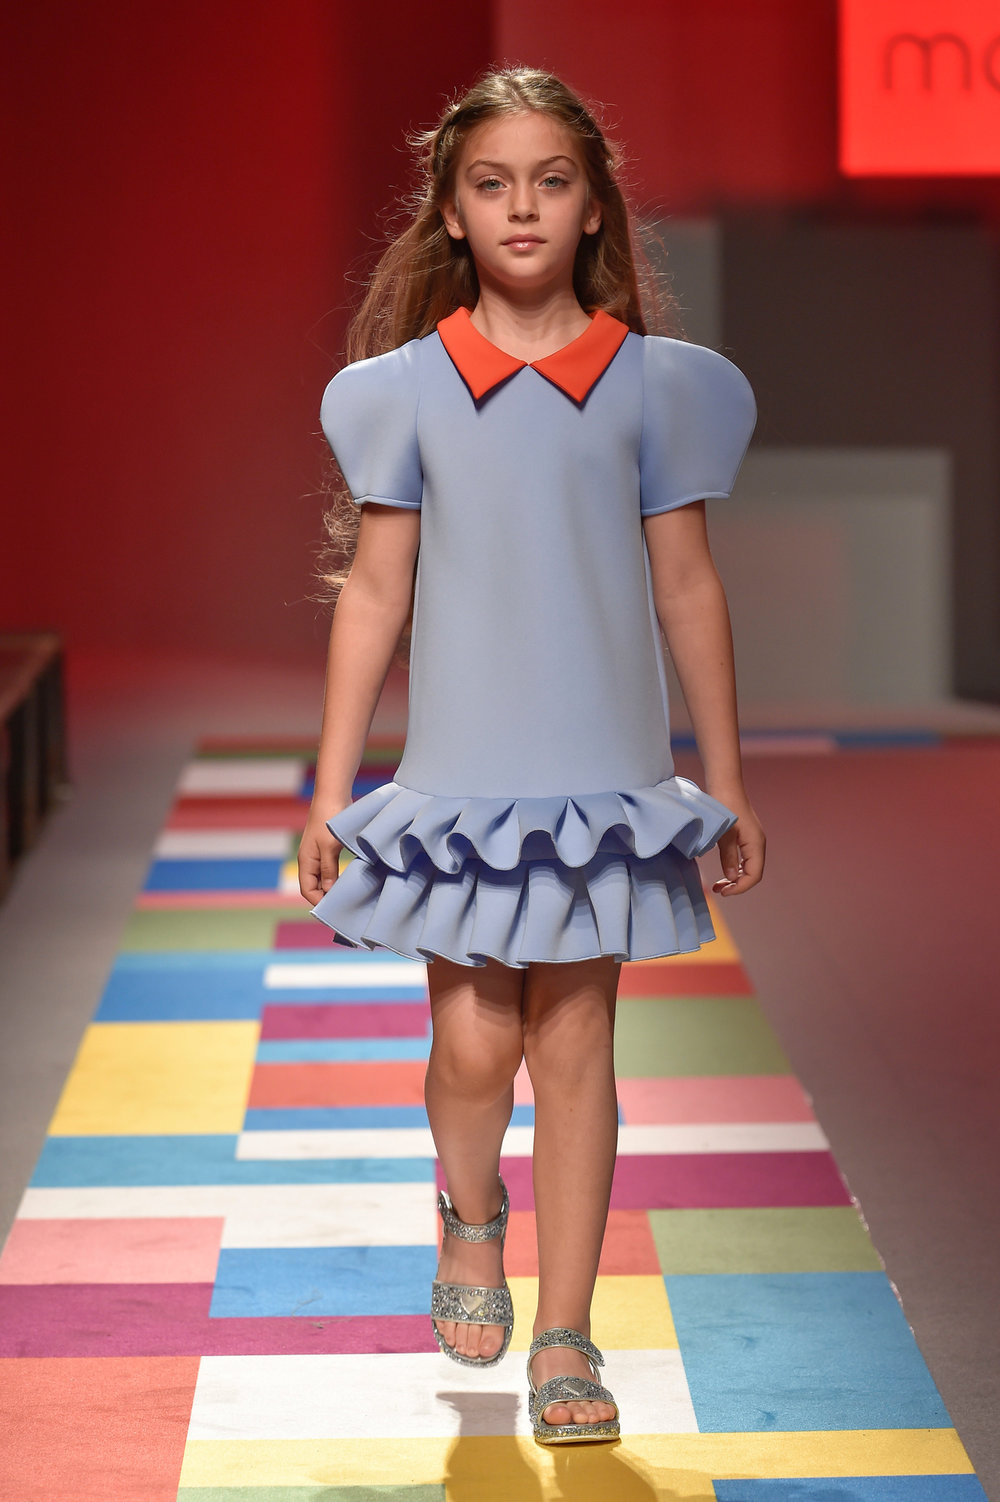 Copy of Stella Dress.JPG